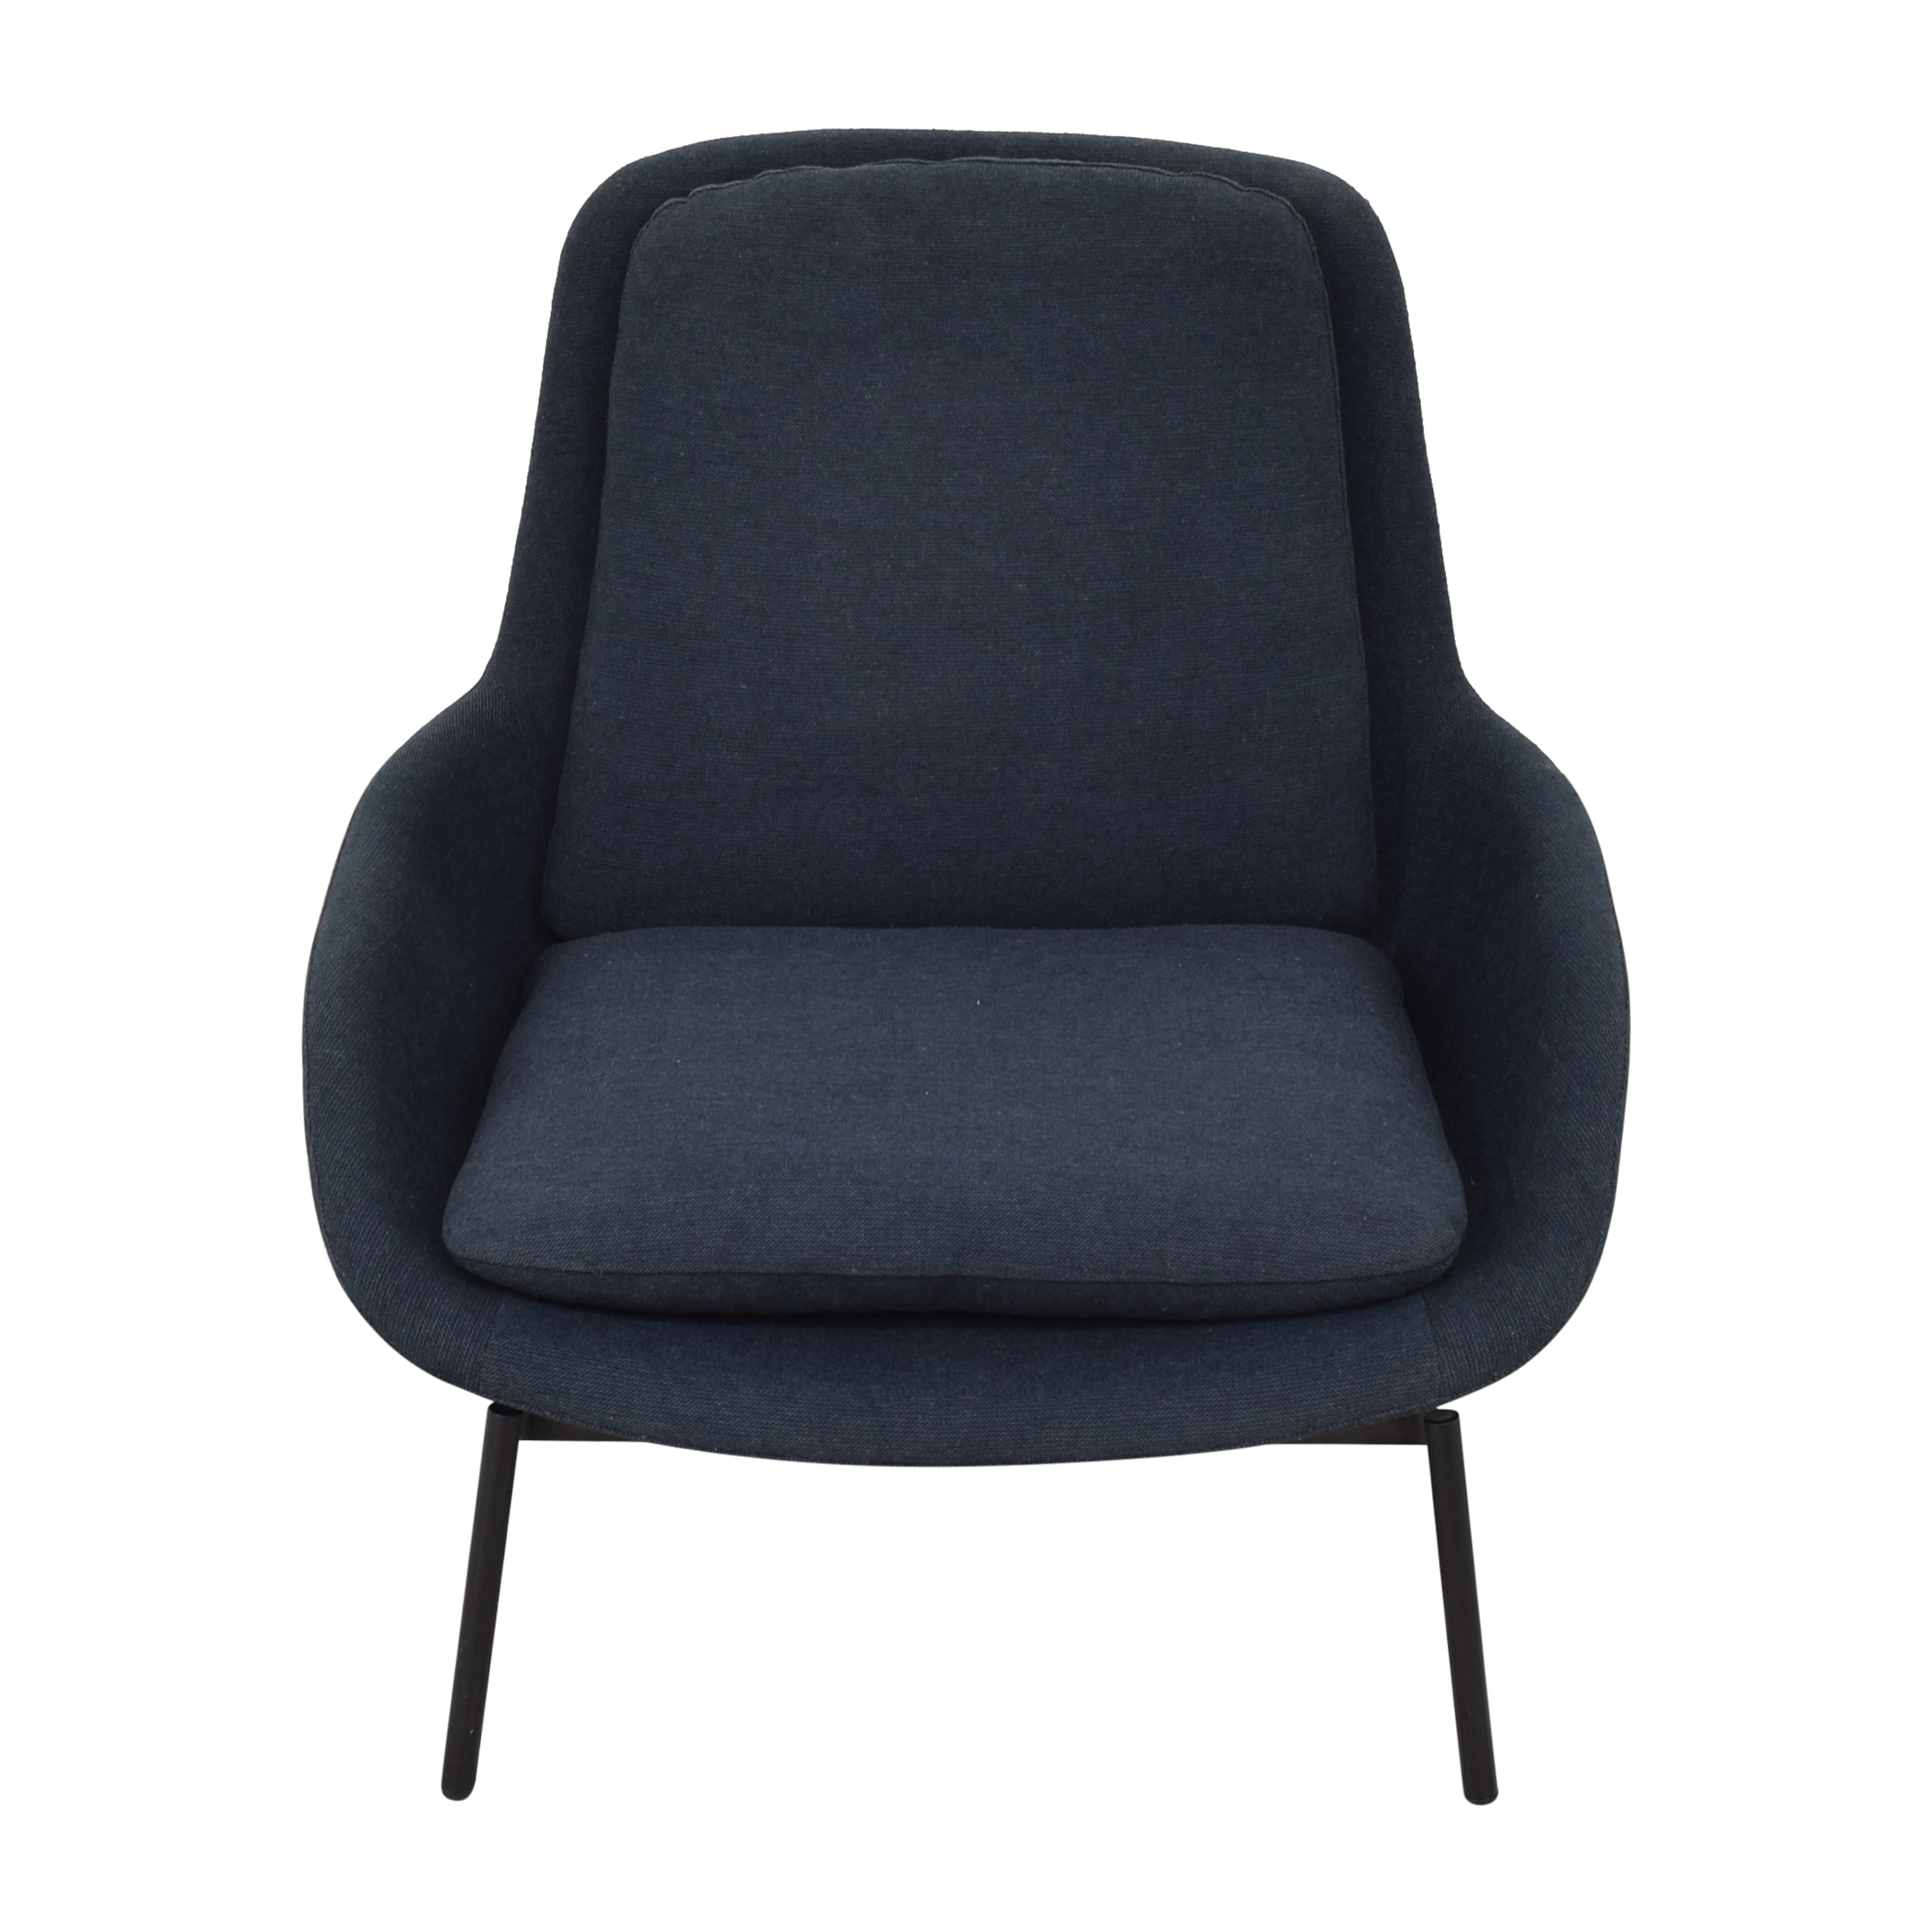 Blu Dot Blu Dot Field Lounge Chair coupon